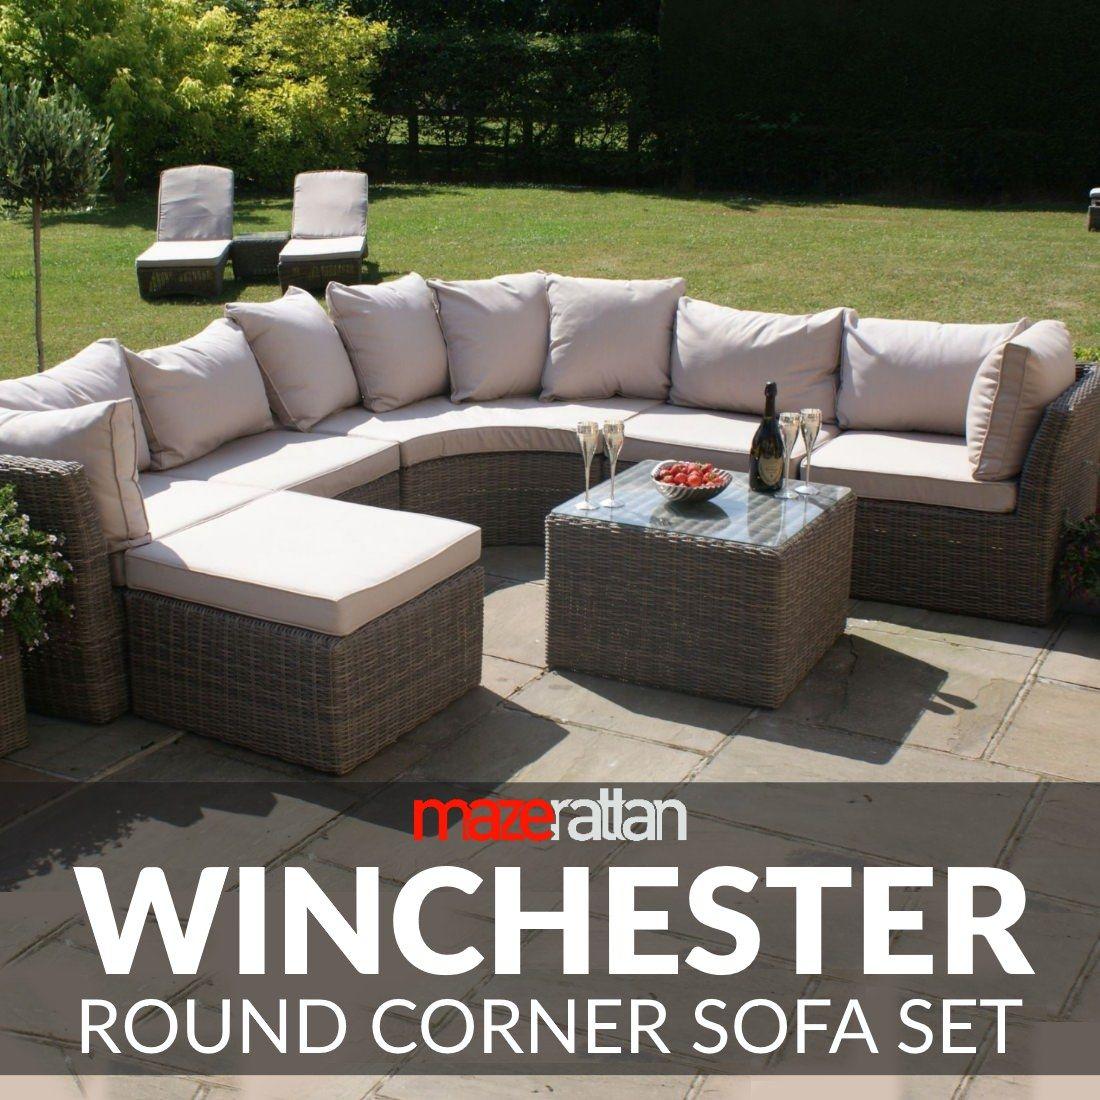 rattan sofa set online india beds at argos maze winchester small corner www